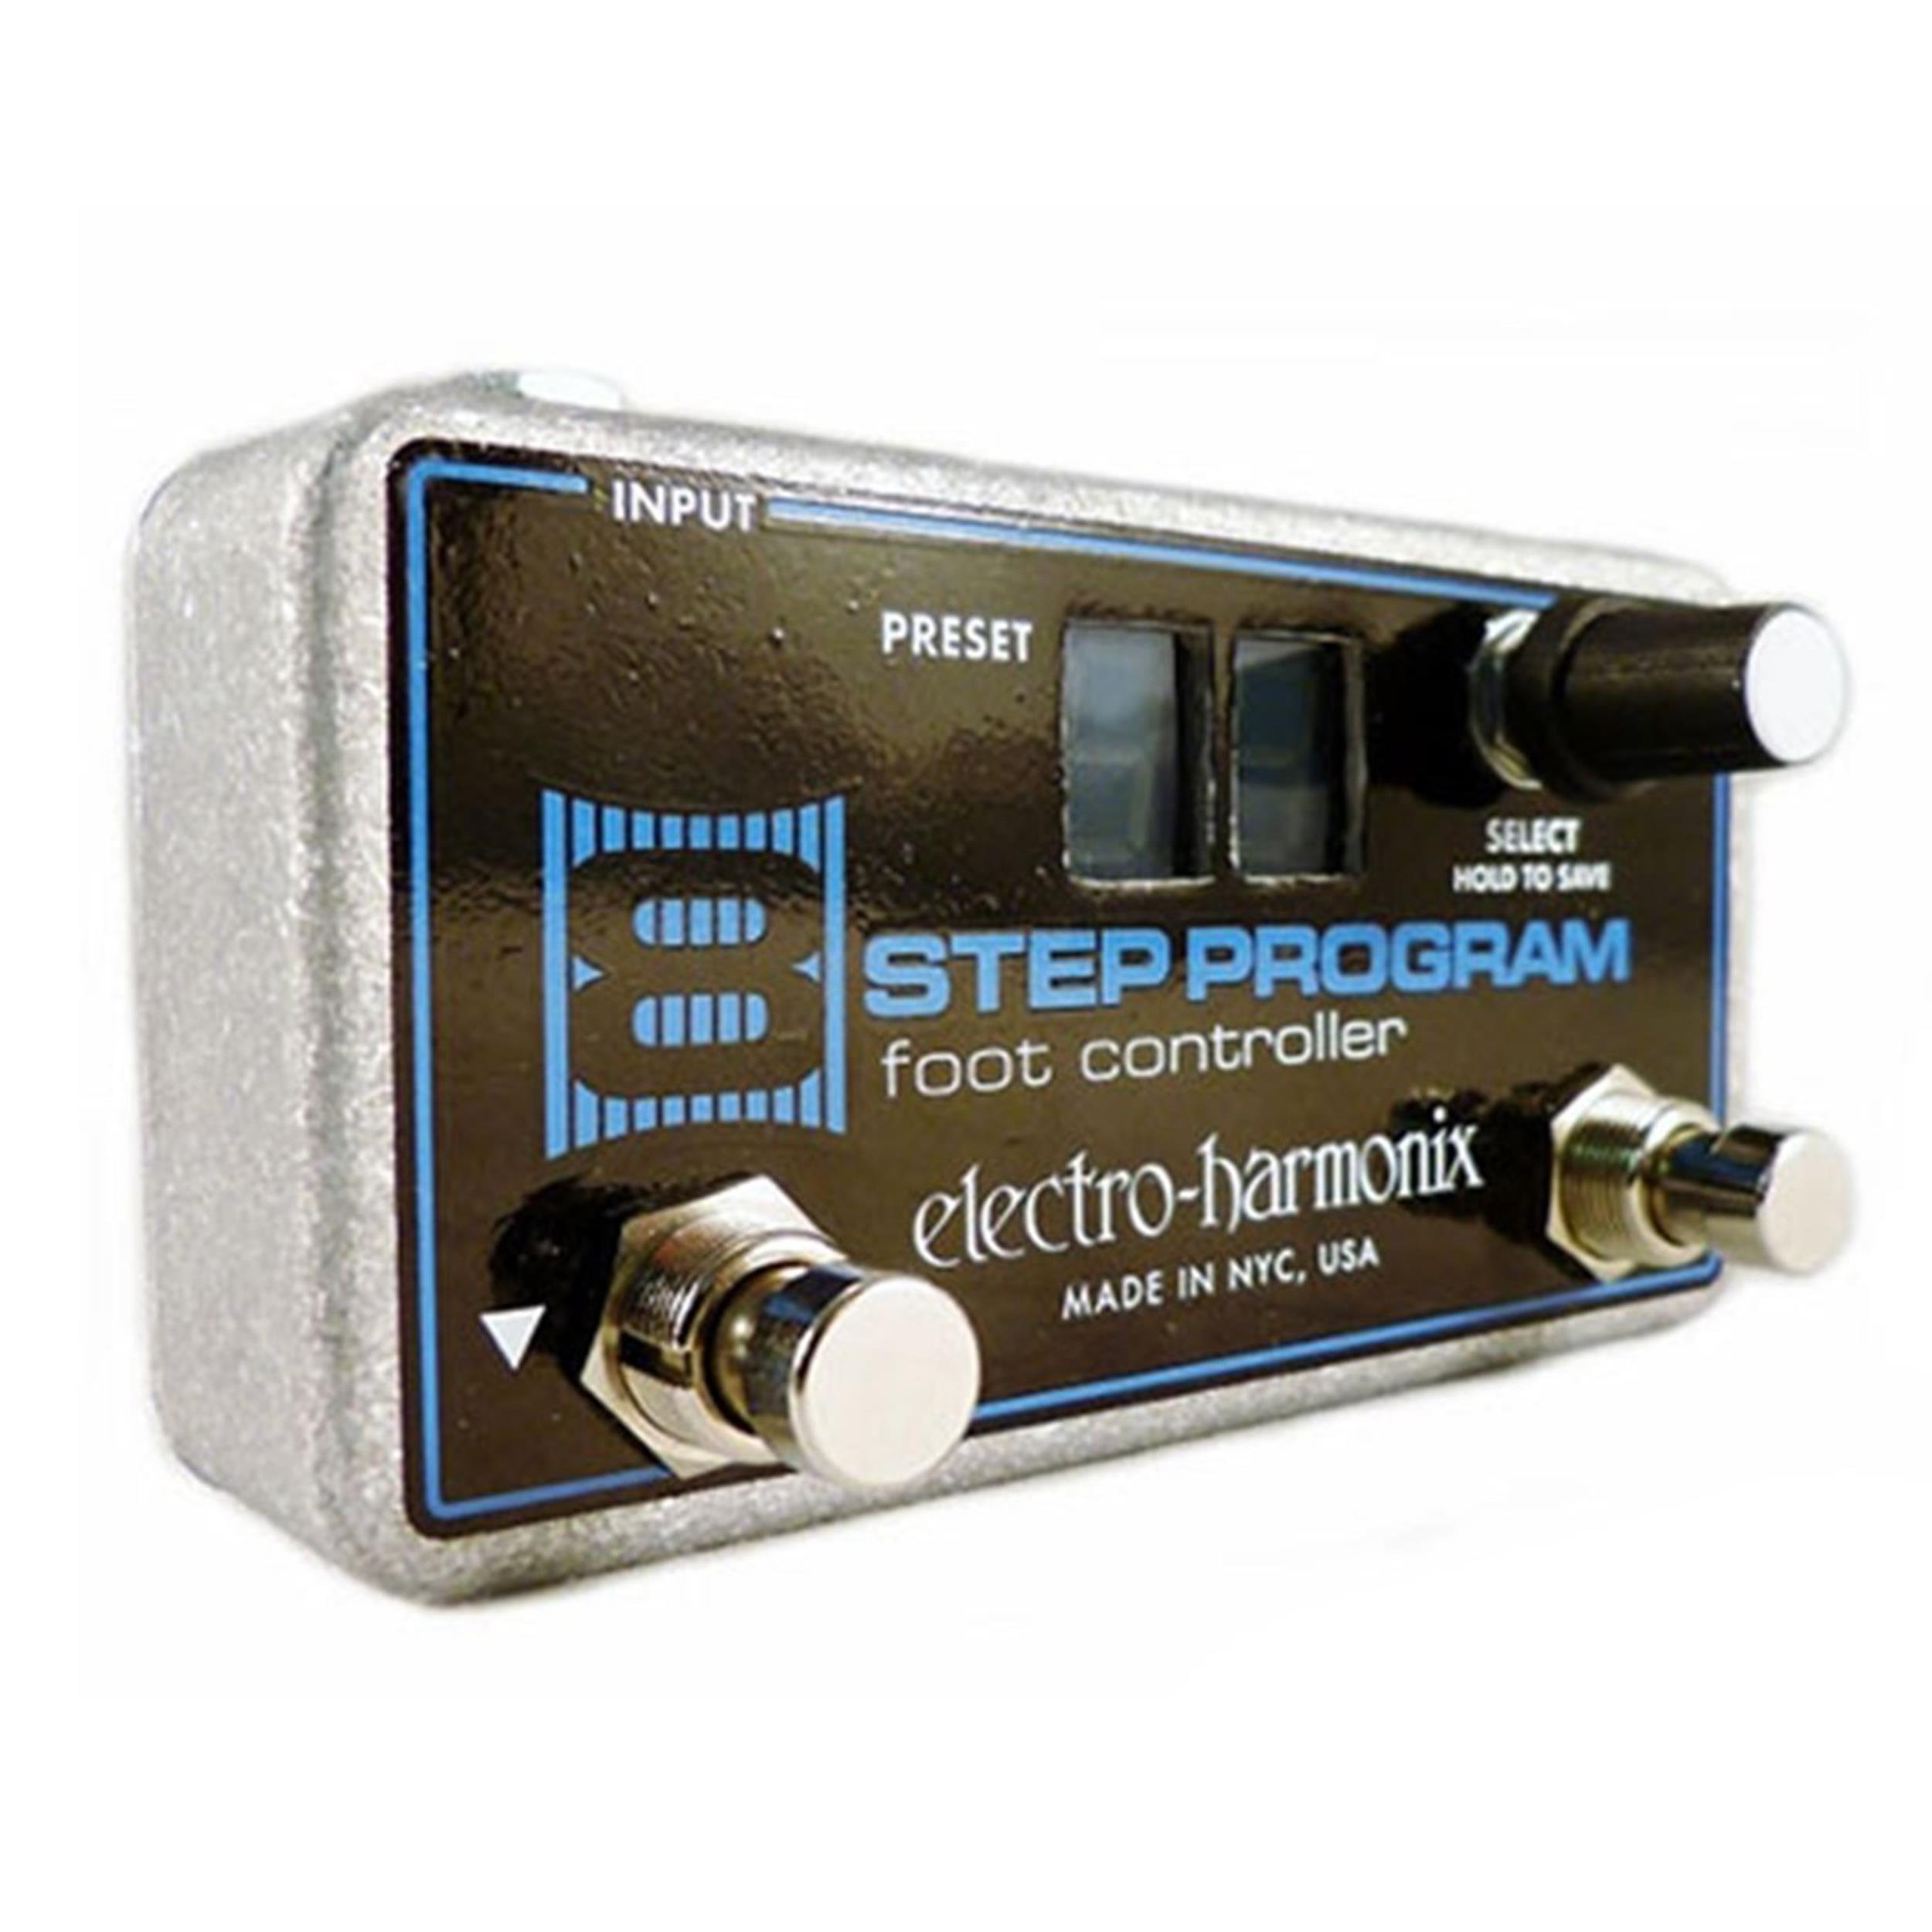 ELECTRO HARMONIX FC 8 STEP PROGRAM FOOT CONTROLLER